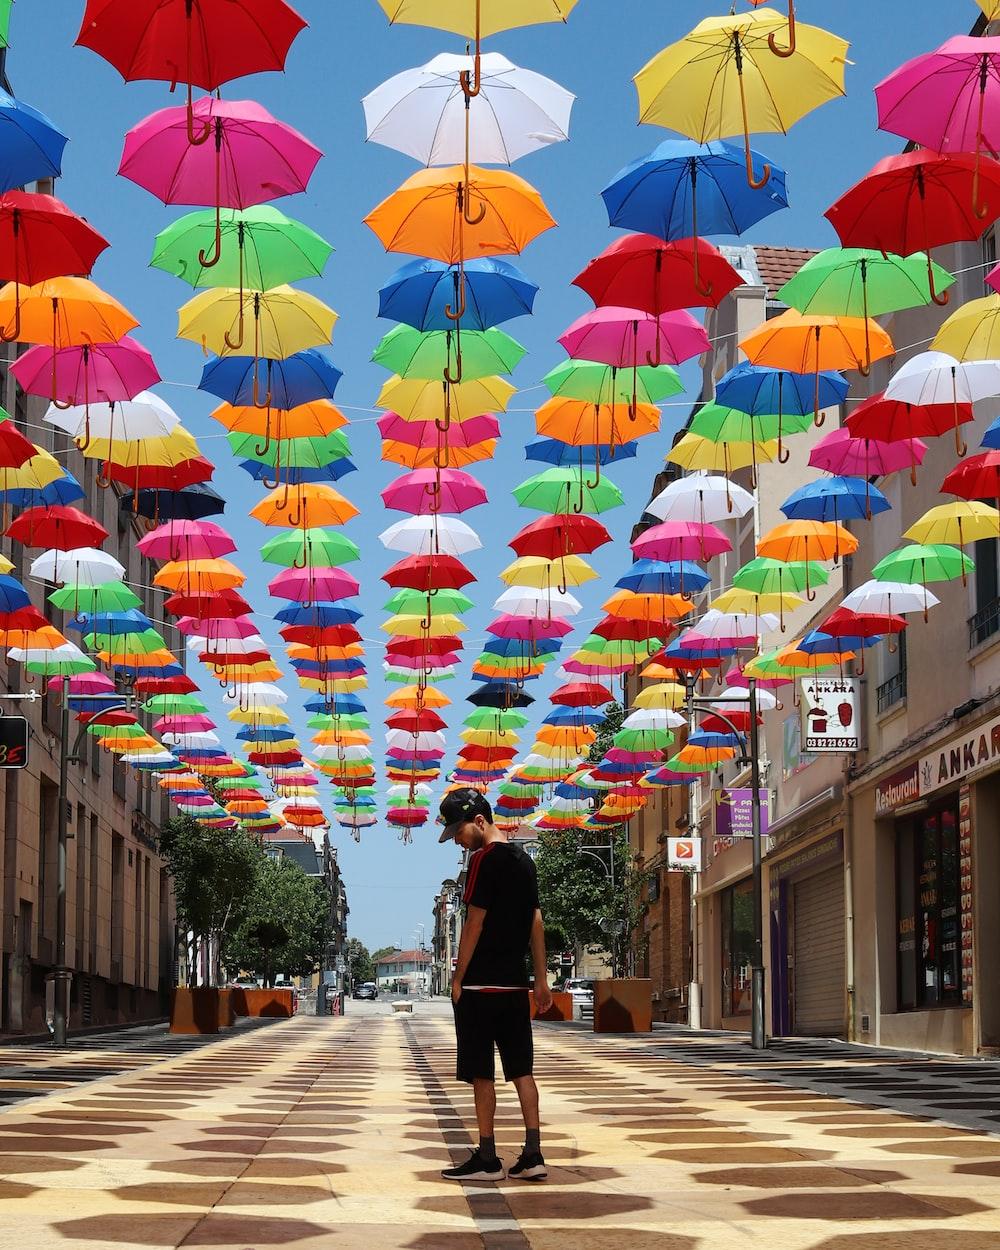 man standing under suspended multicolored umbrellas in street photo – Free Human Image on Unsplash